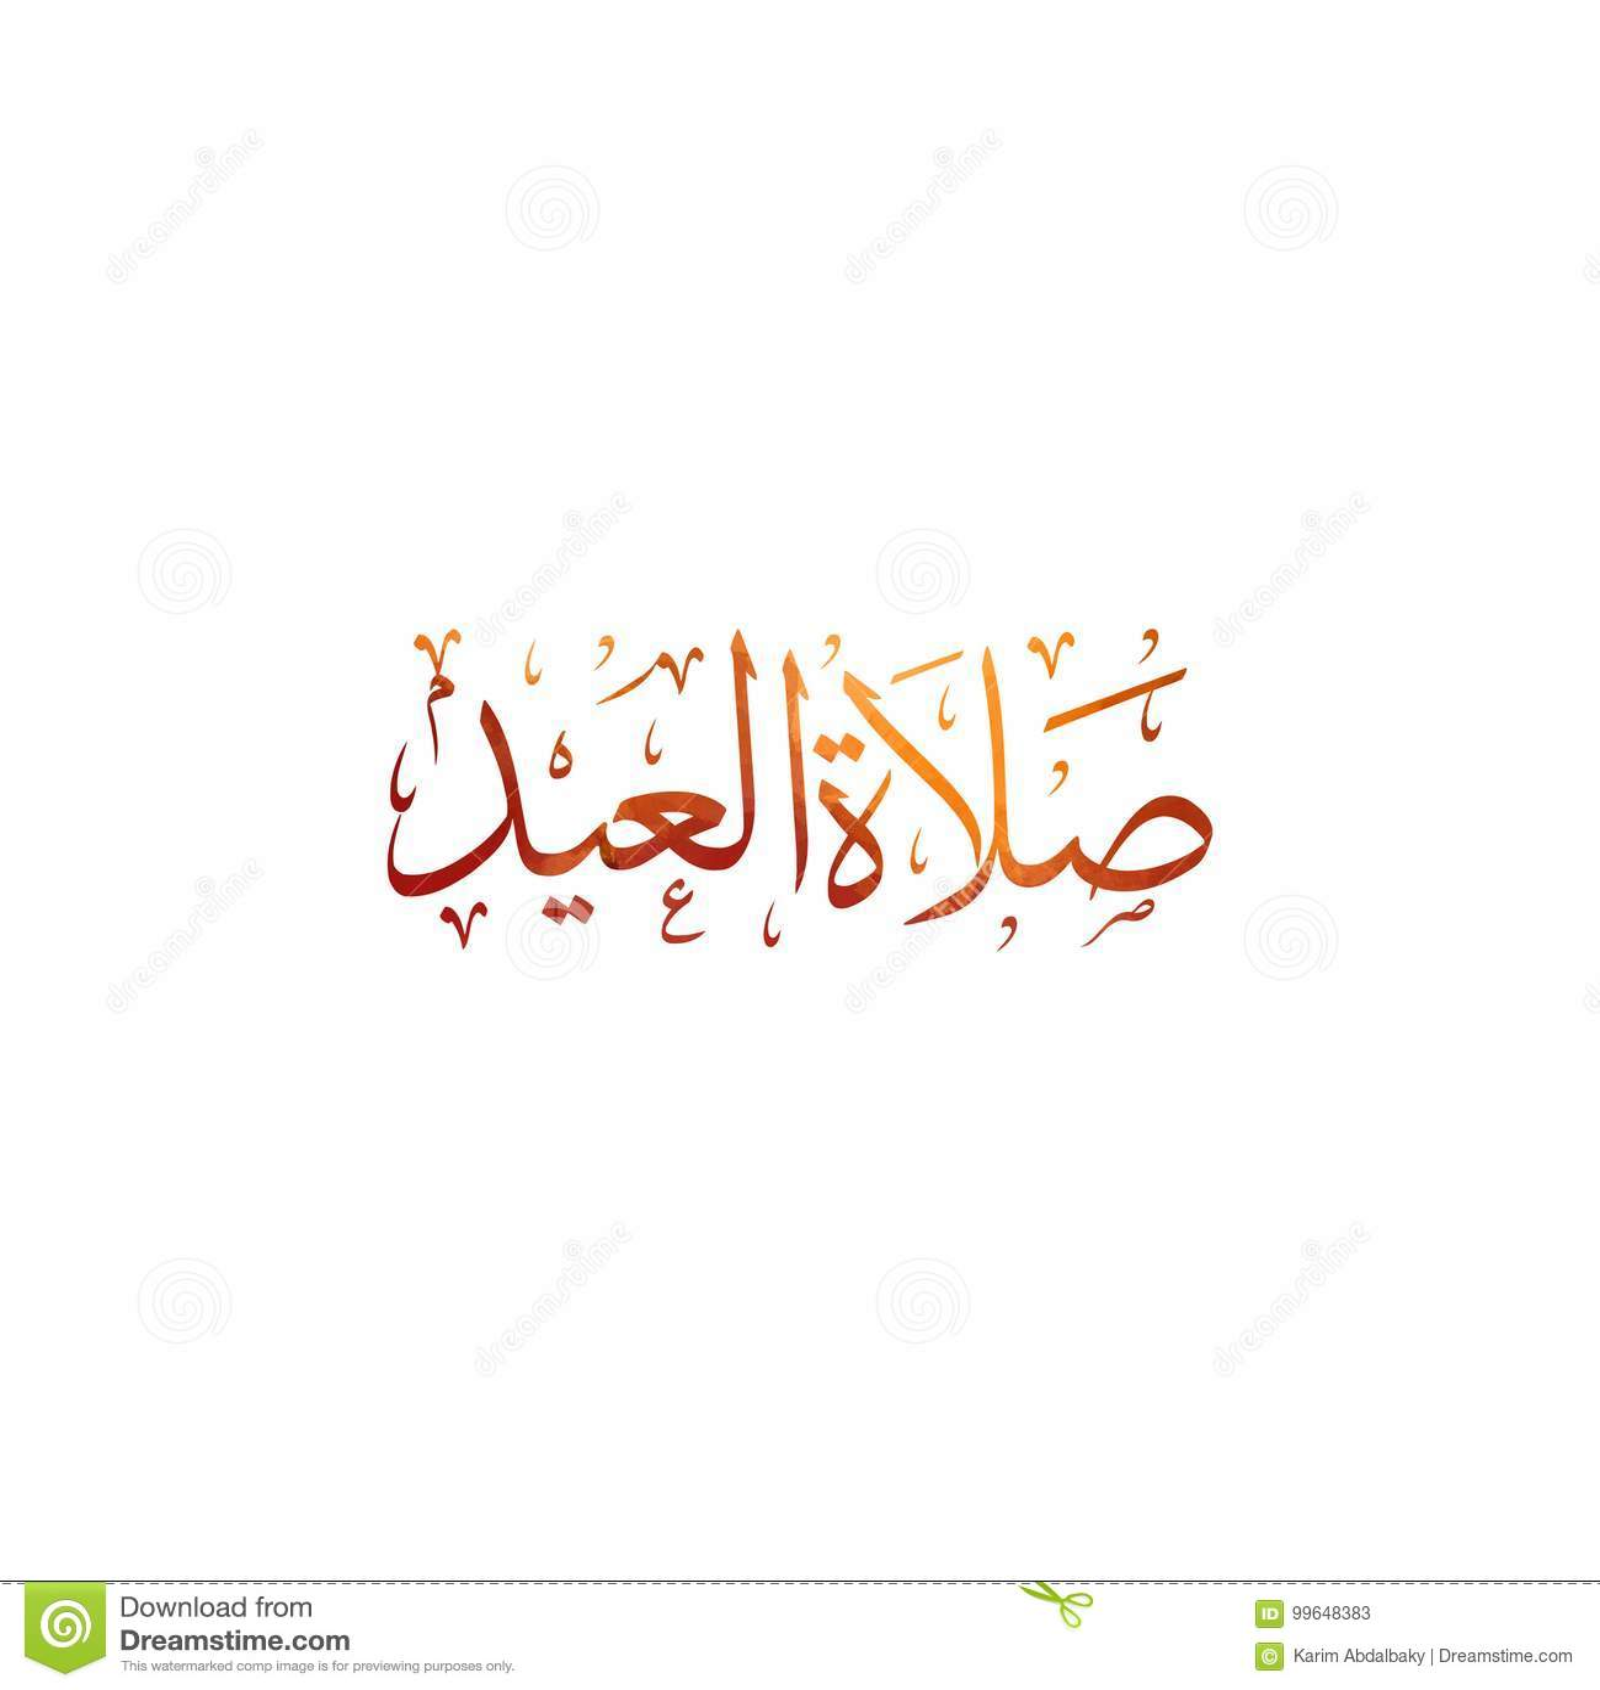 Arabic calligraphy of an eid greeting happy eid al adha eid al download arabic calligraphy of an eid greeting happy eid al adha eid al fitr m4hsunfo